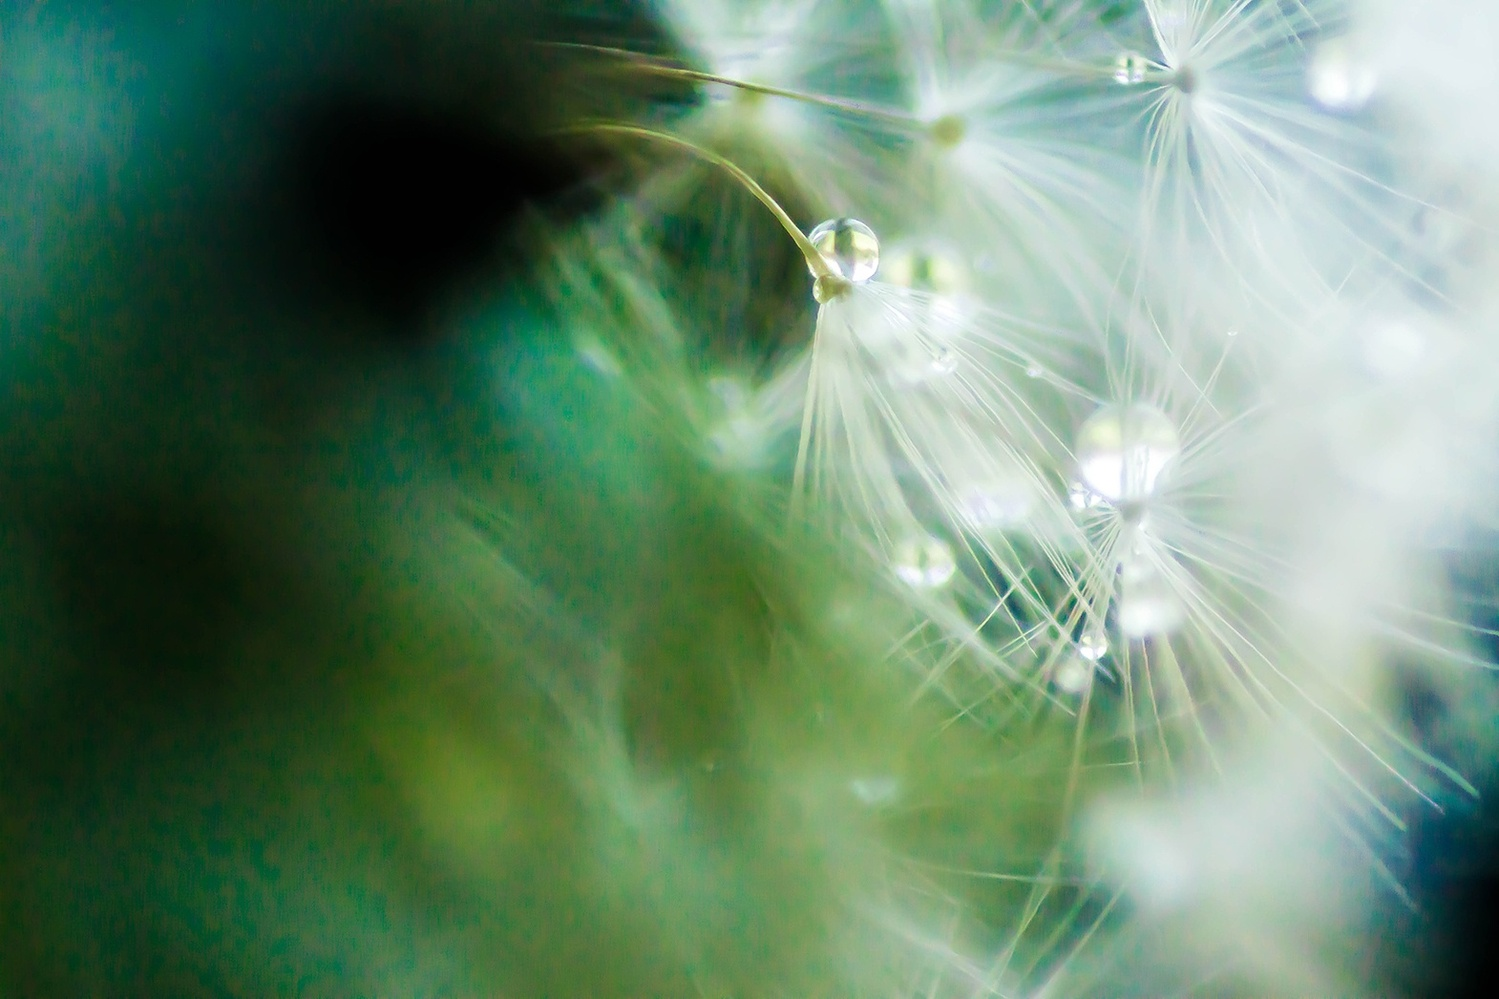 Dandelion Mist by Novak Miler